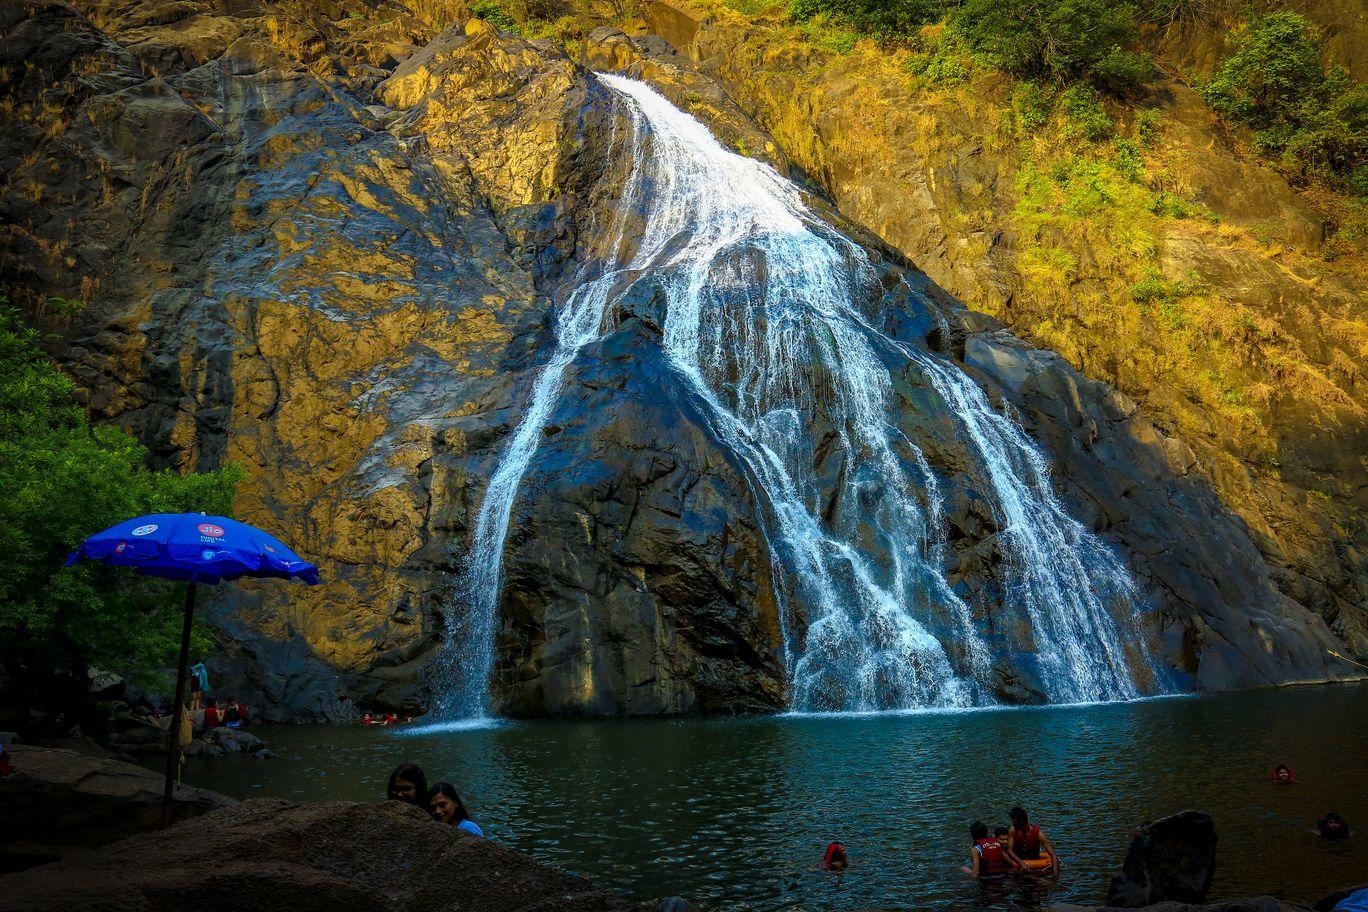 Photo of Dudhsagar Falls By Mohammed Sami